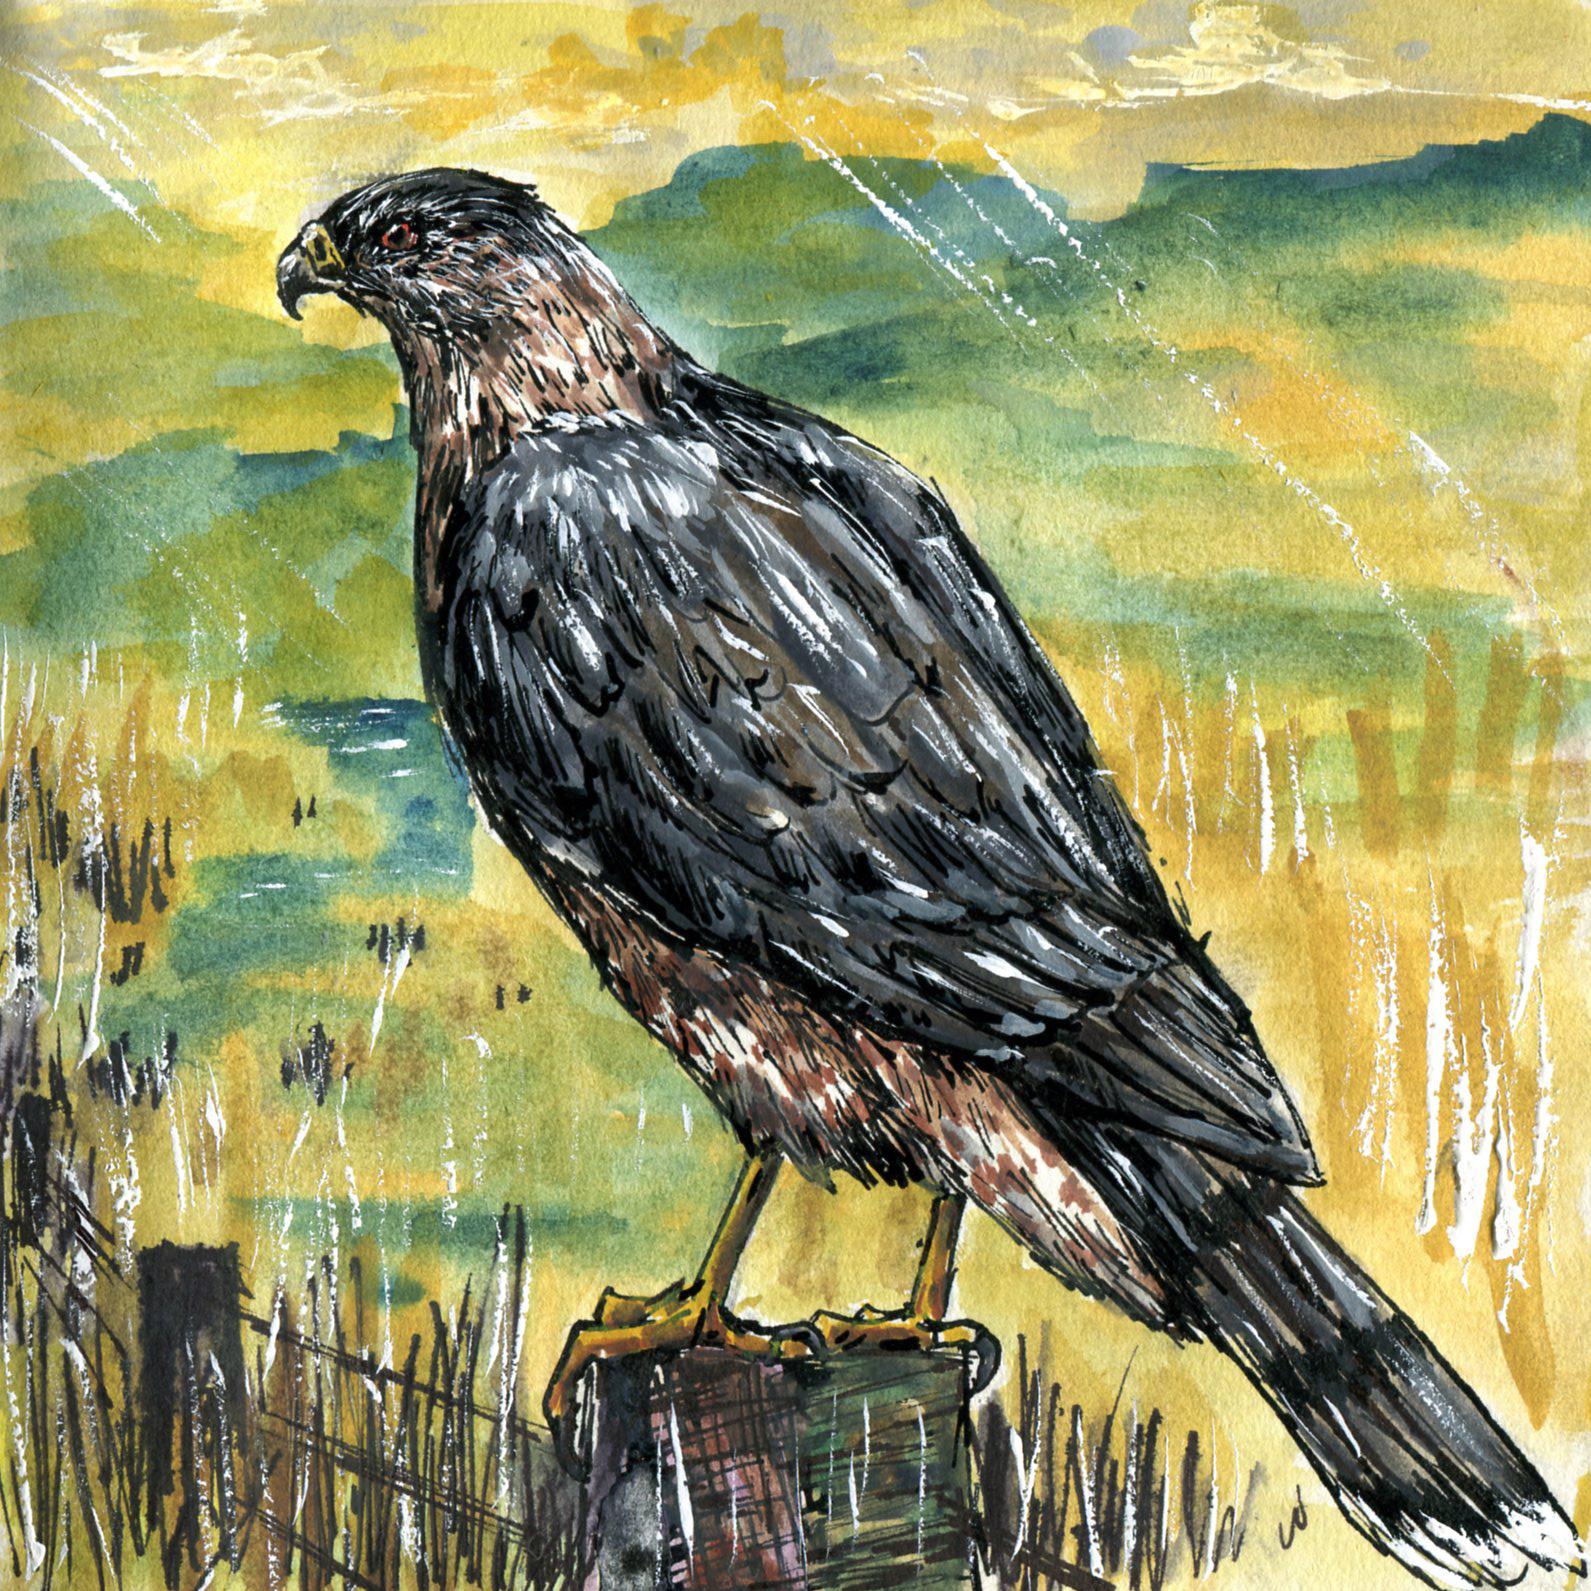 105. Cooper's Hawk